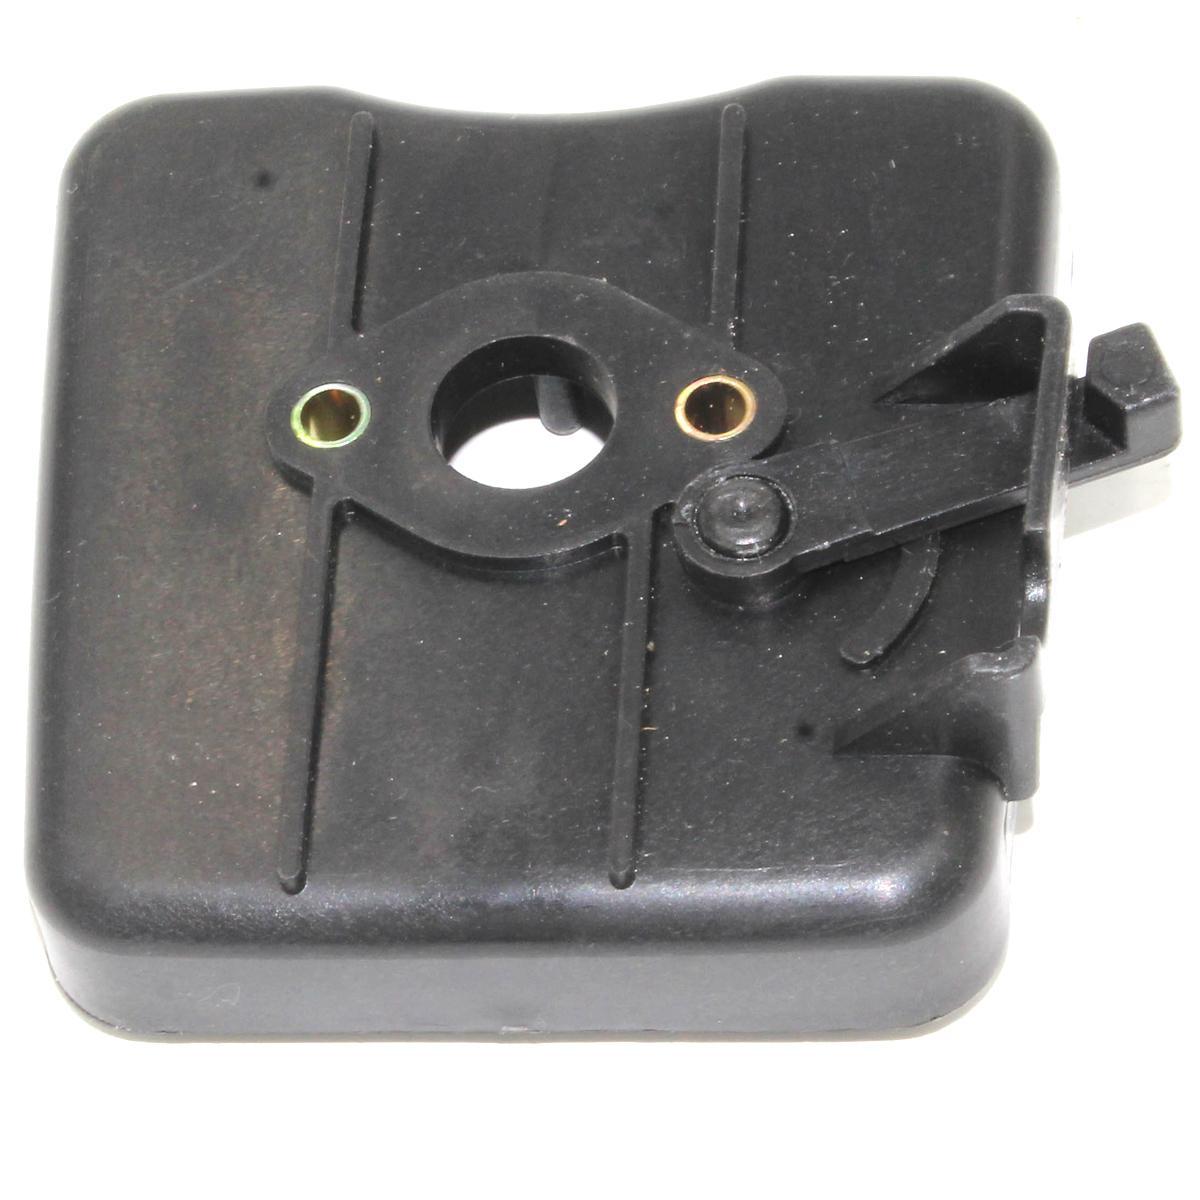 0926044 Air cleaner base Homelite Engine Parts